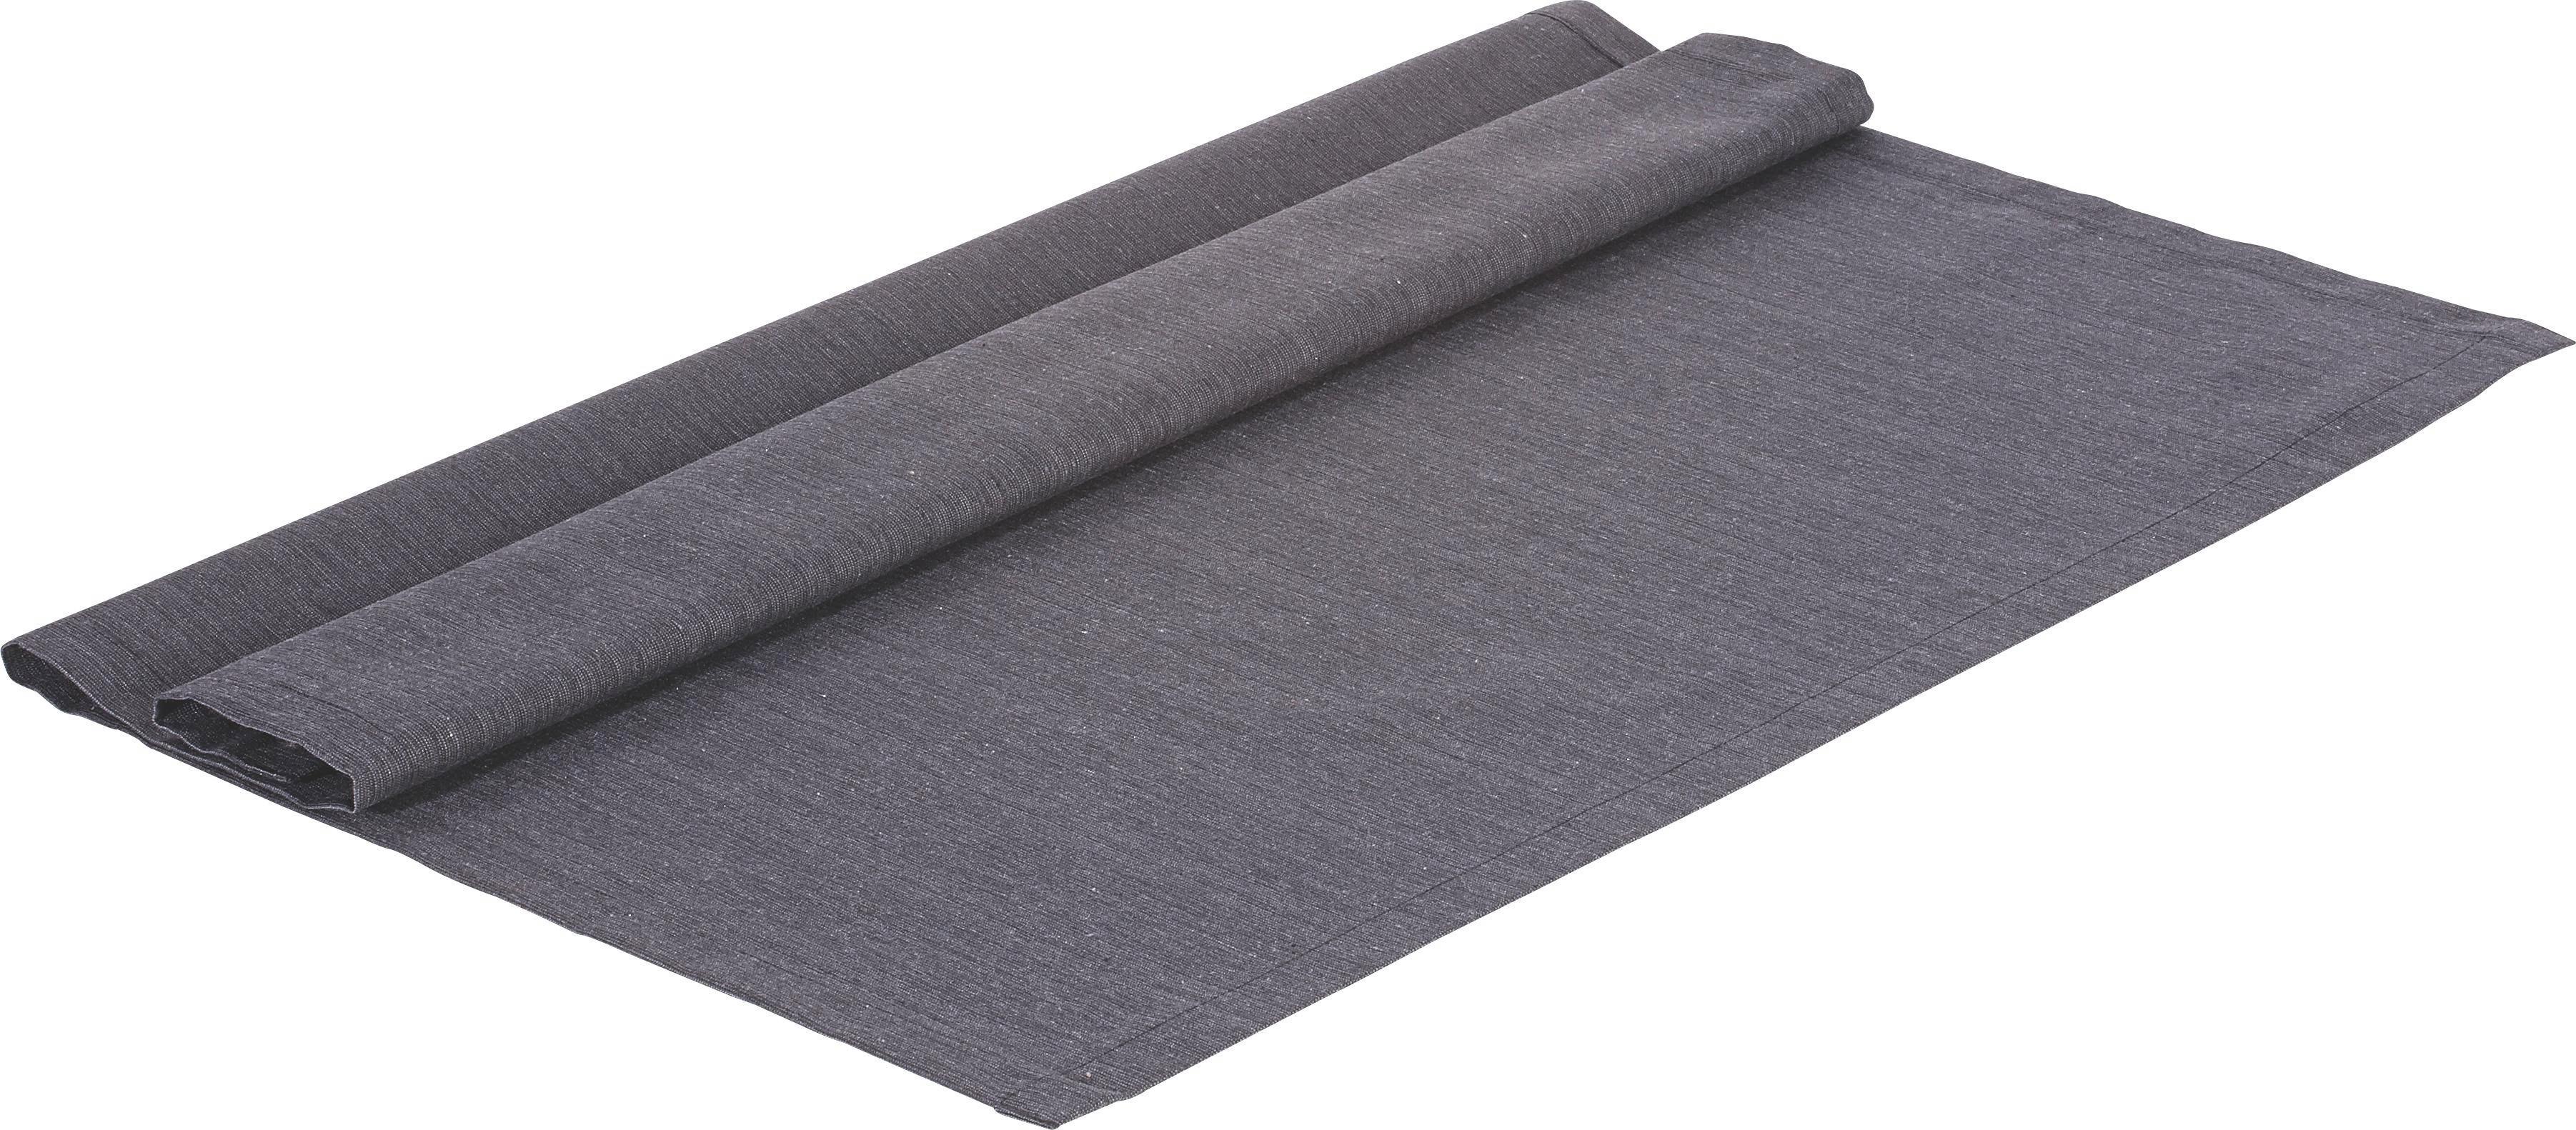 TISCHDECKE Textil Leinwand, Struktur Anthrazit 80/80 cm - Anthrazit, Textil (80/80cm) - NOVEL